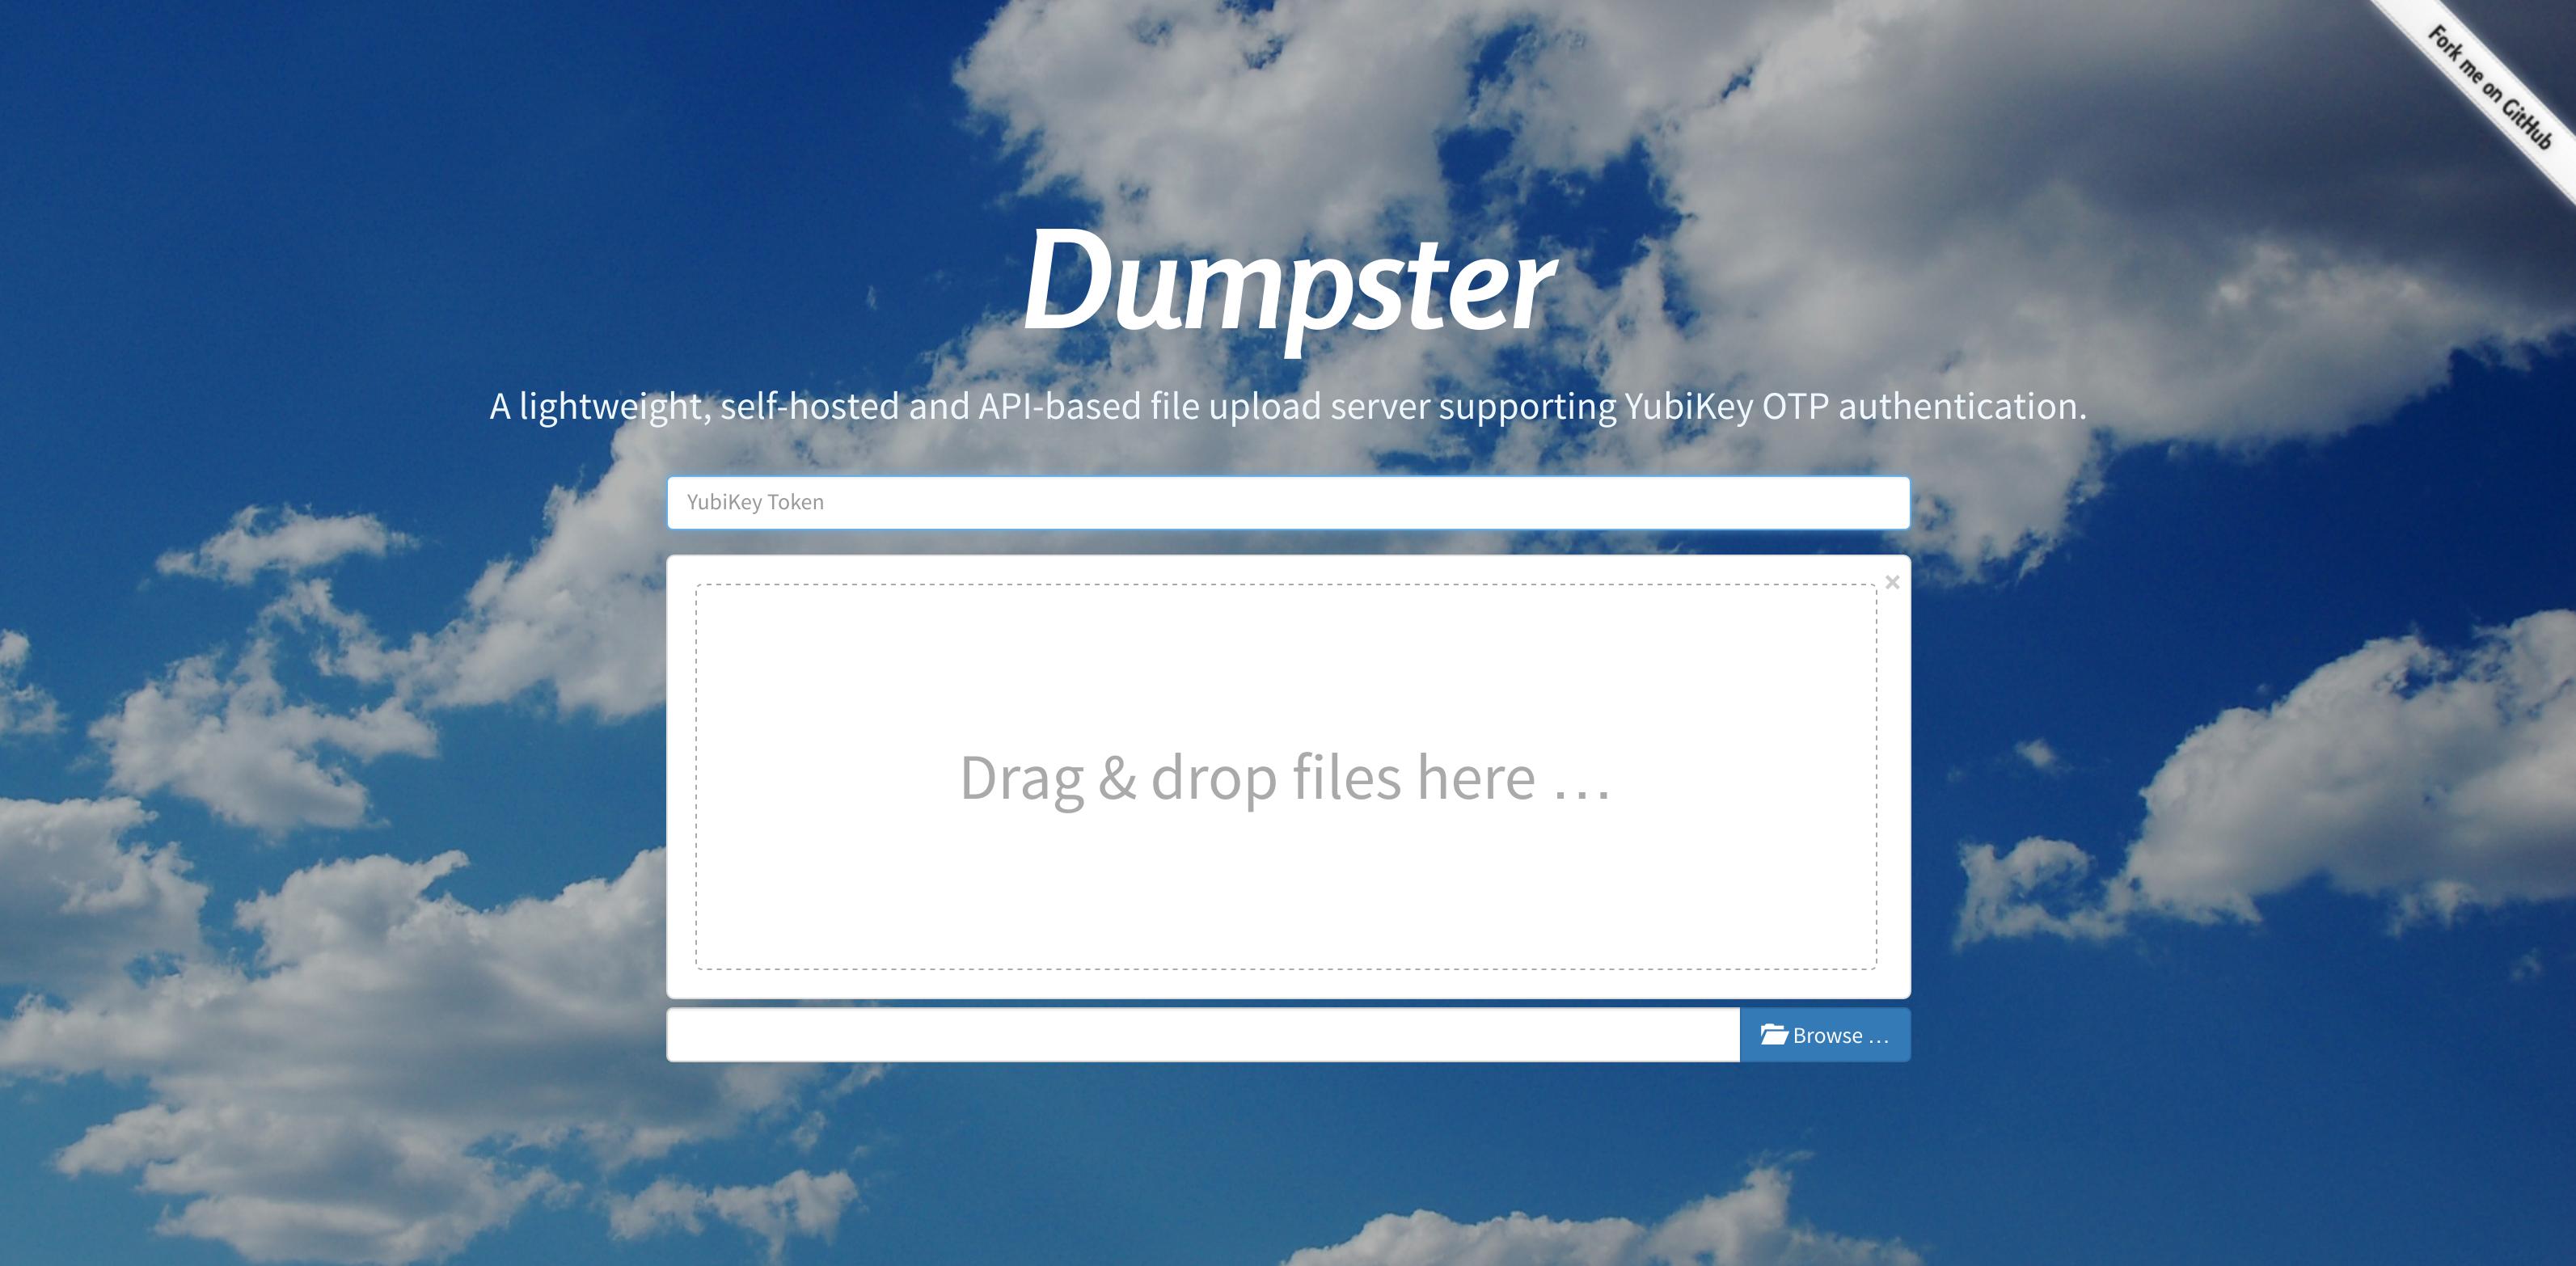 WebUI demo